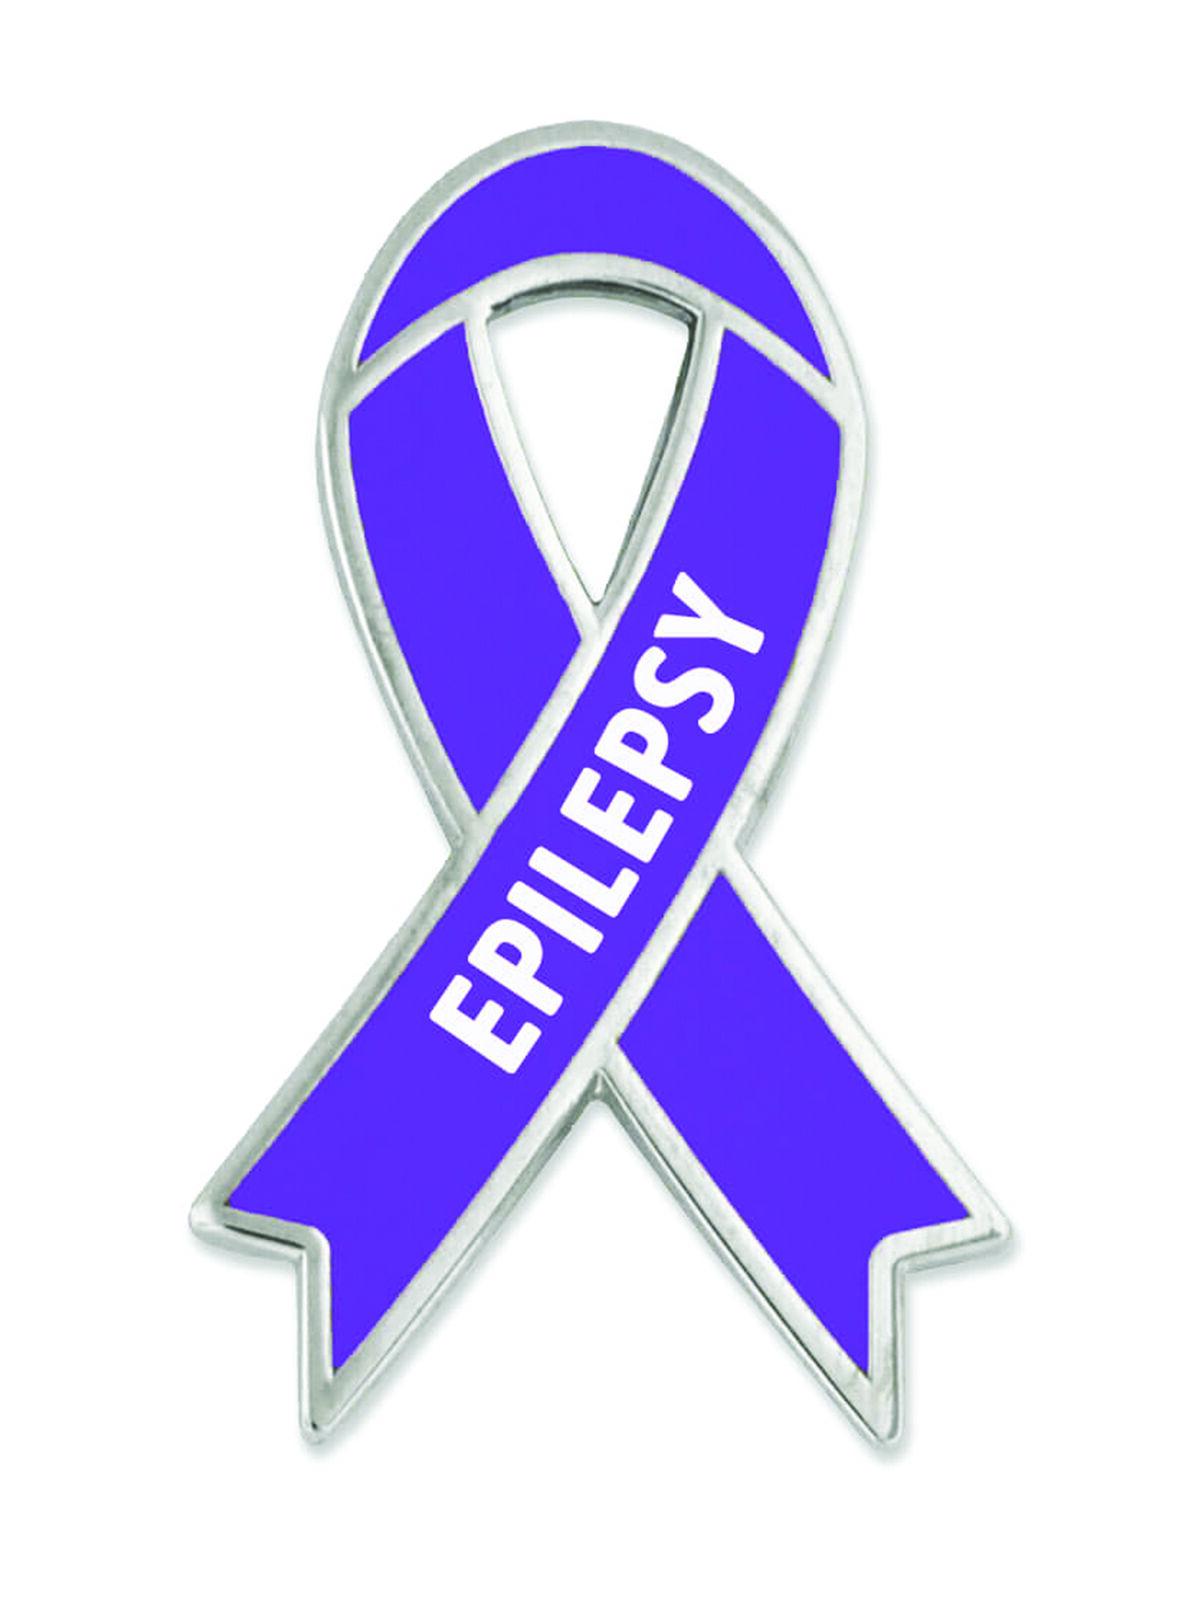 45d8b2f0c86 PinMart s Epilepsy Purple Awareness Ribbon Enamel Lapel Pin ...